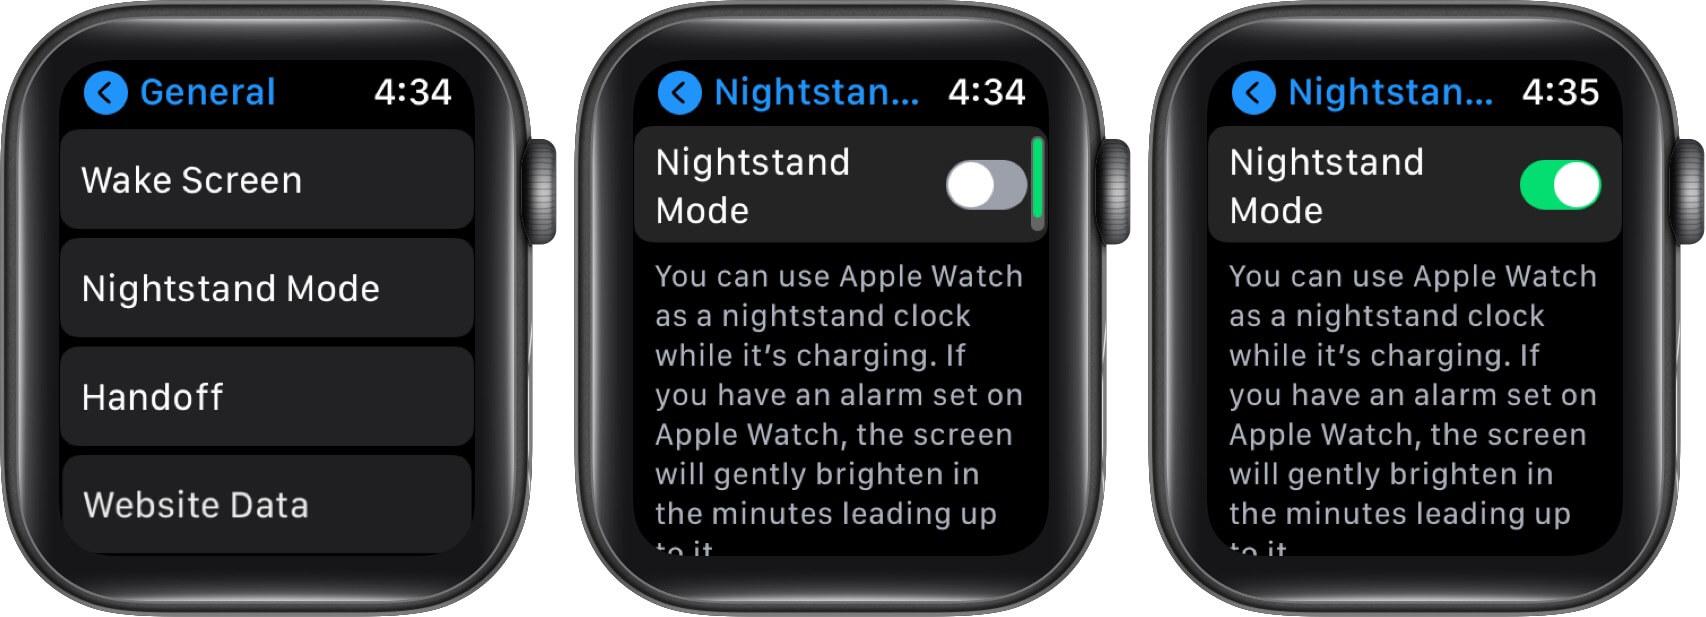 Turn ON Nightstand Mode on Apple Watch